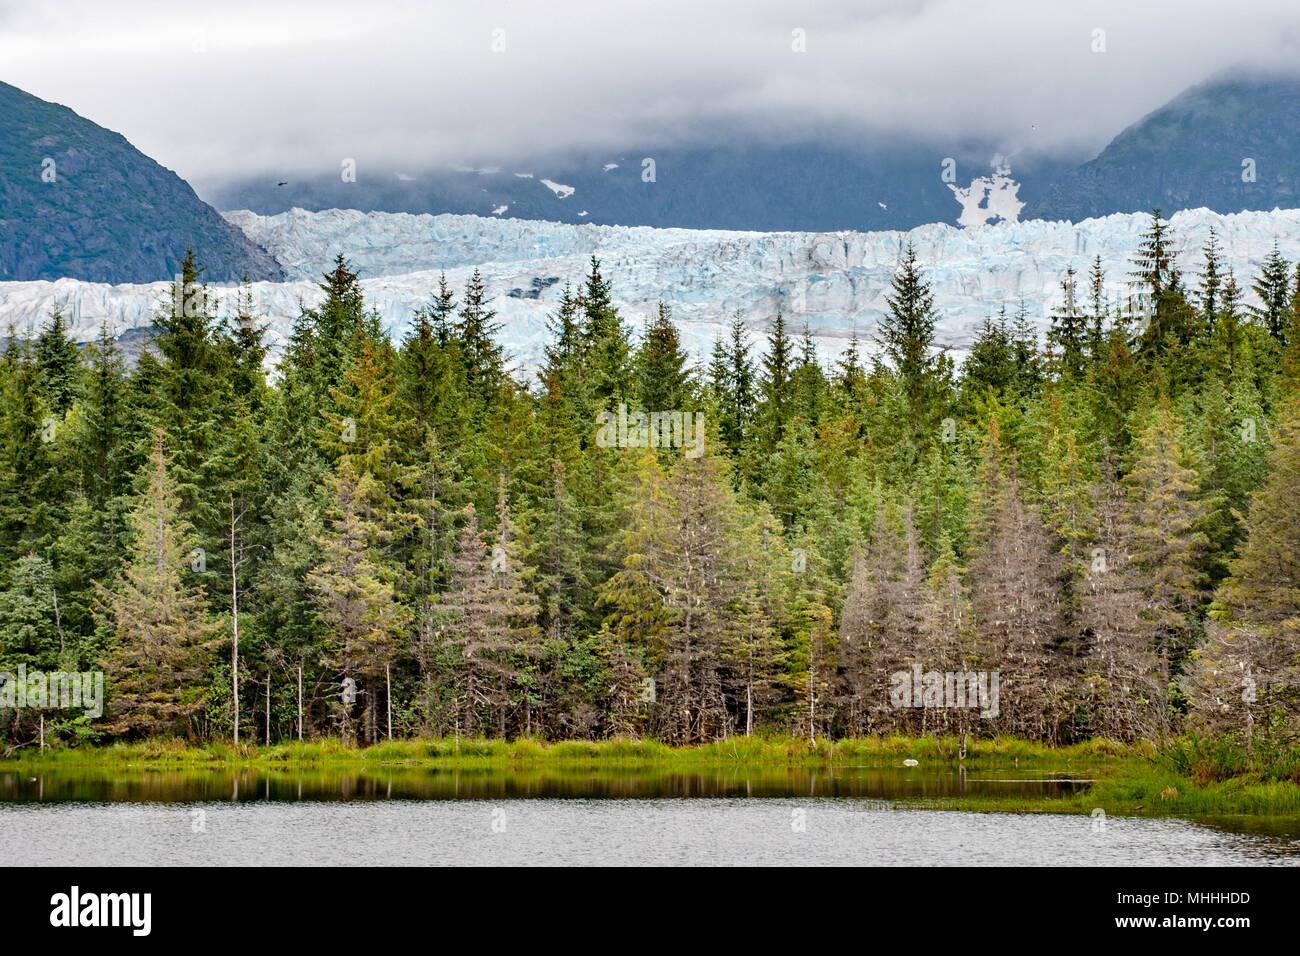 Mendenhall Glacier near Juneau, Alaska - Stock Image